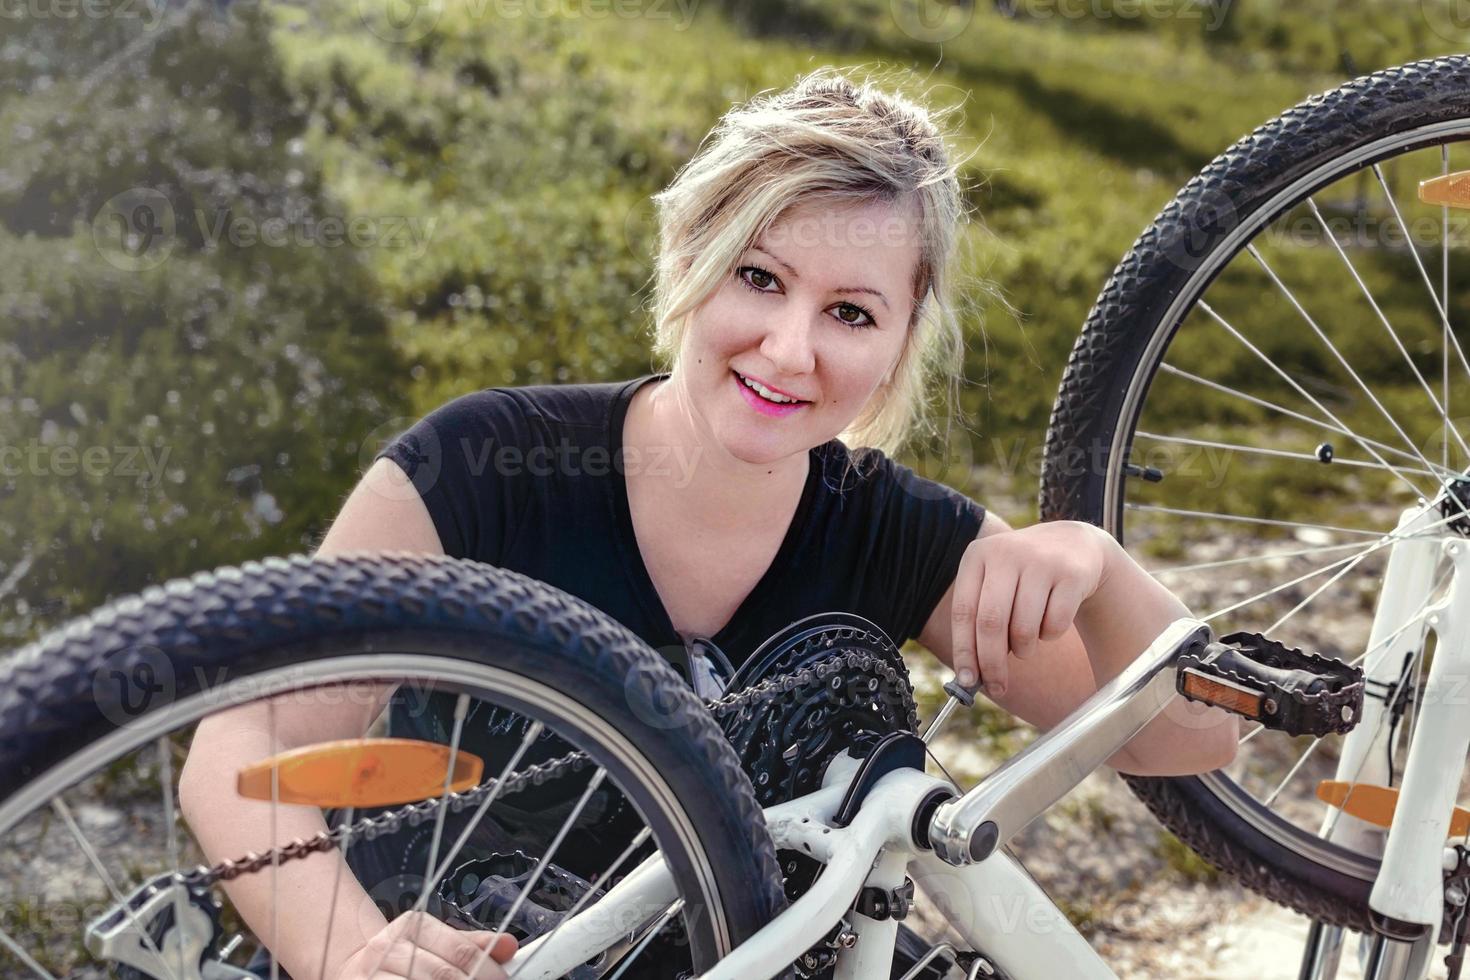 mujer reparar su bicicleta foto